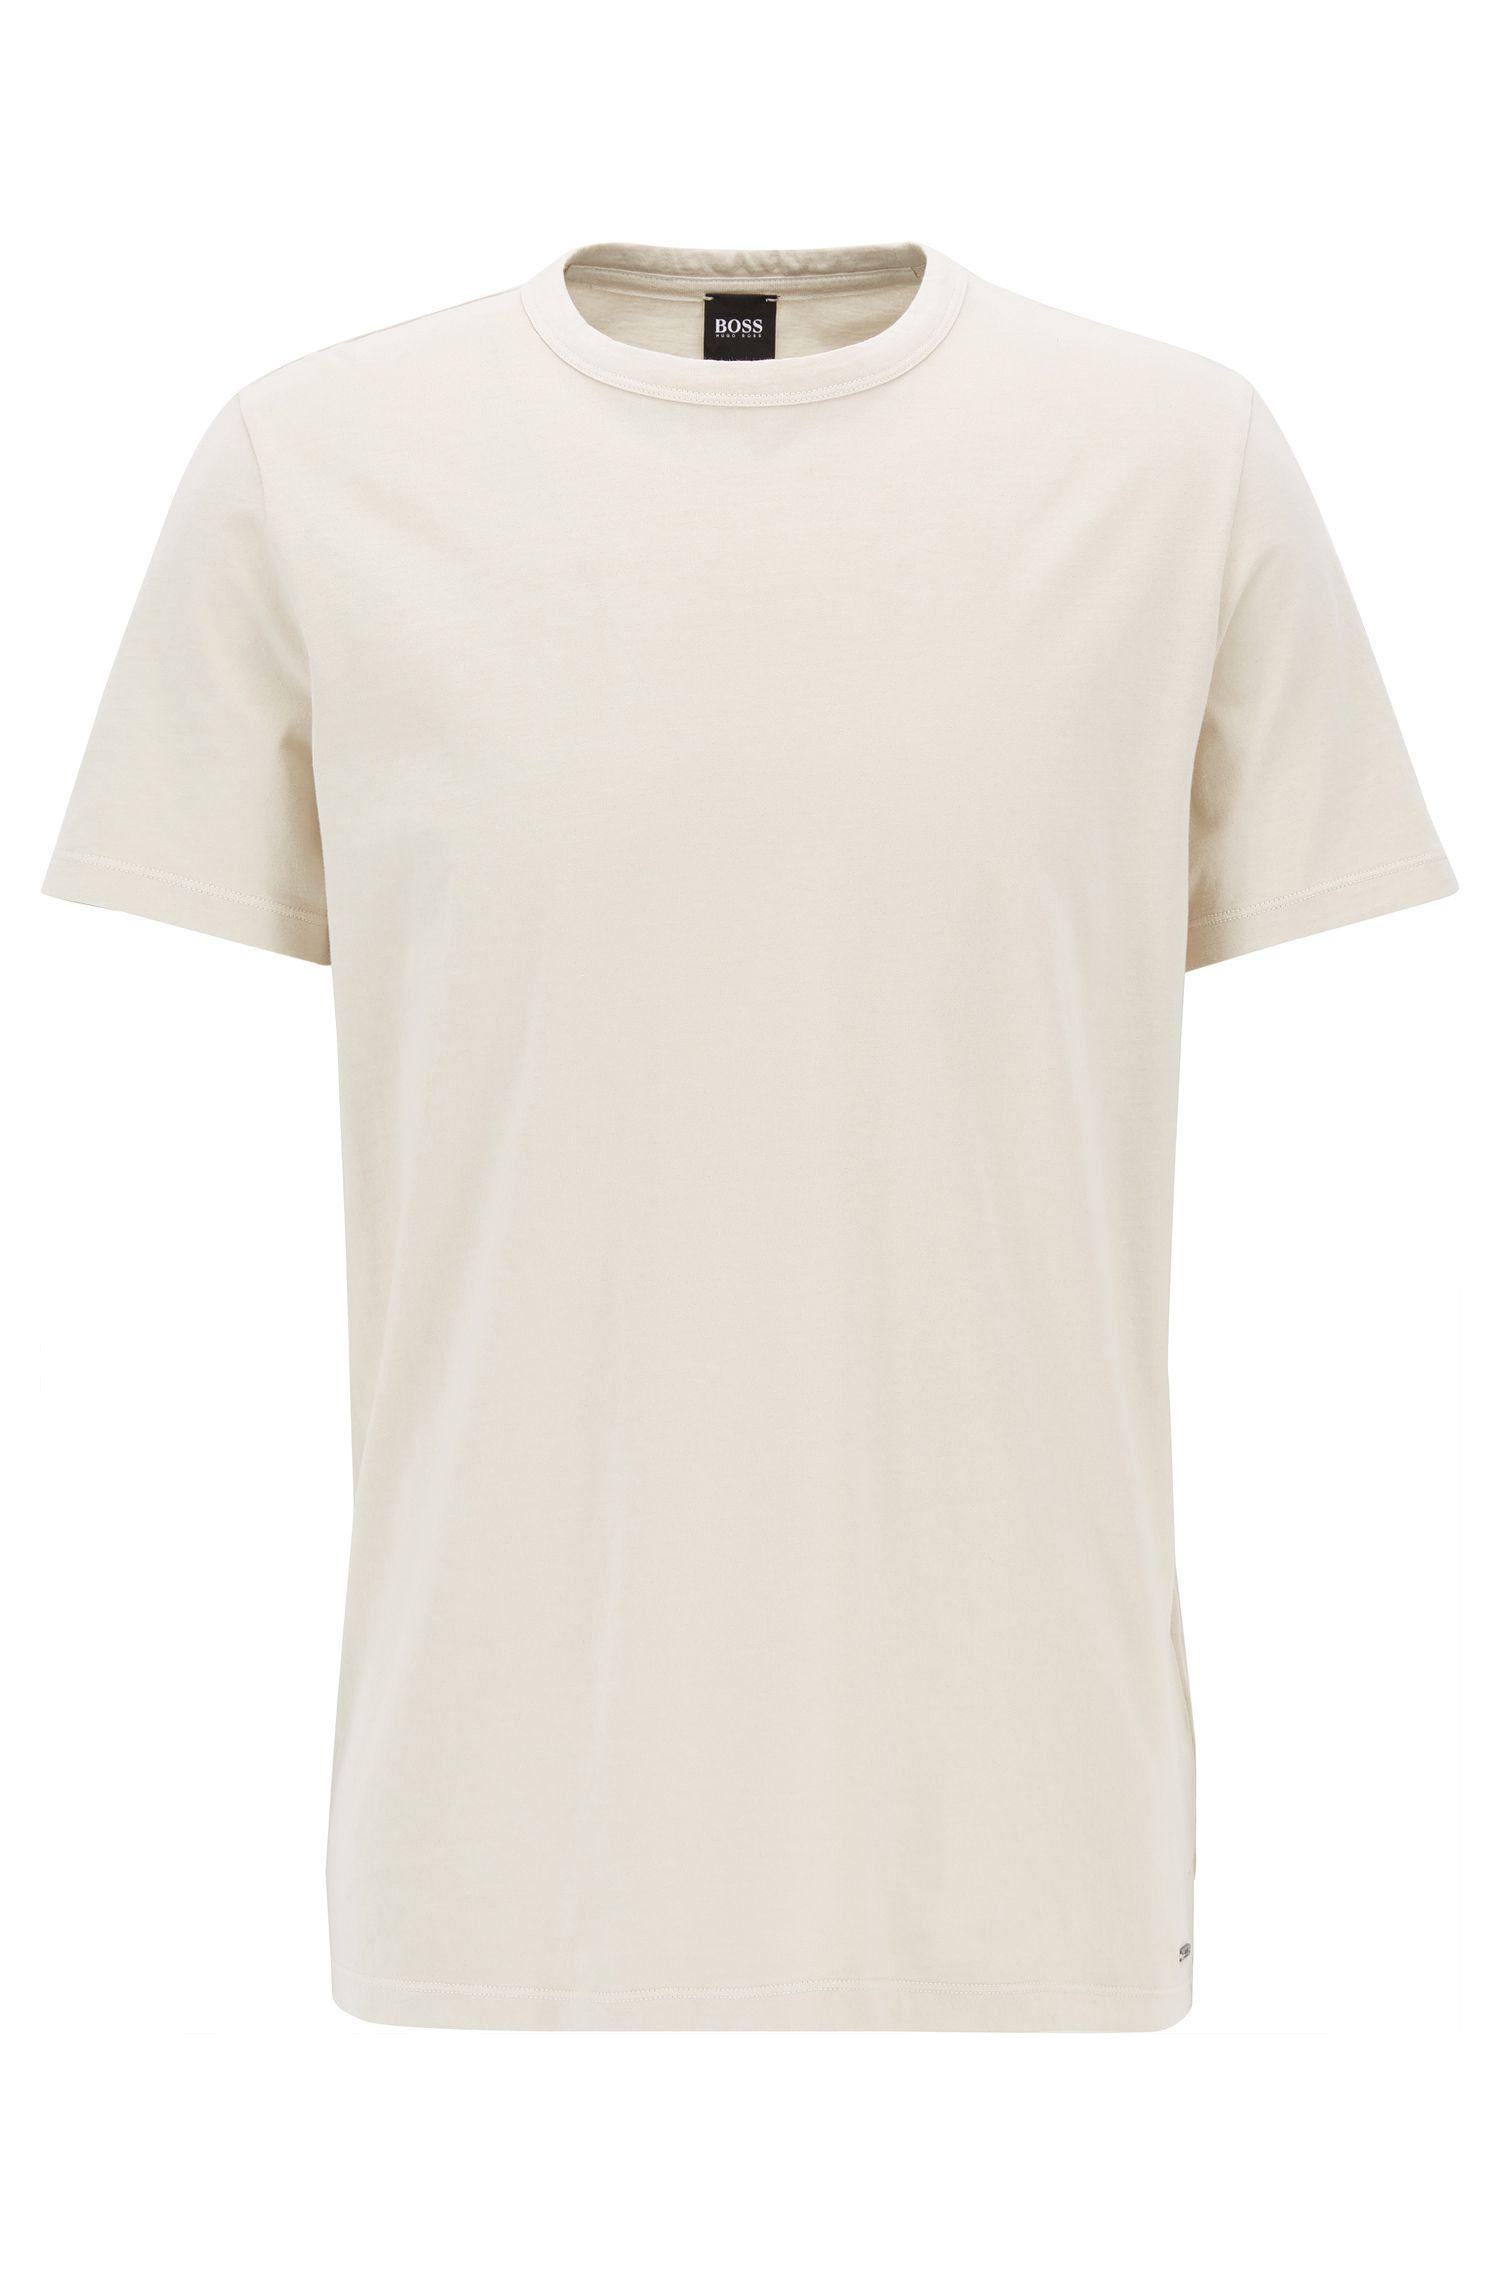 Garment Washed Cotton T-Shirt | Tessler